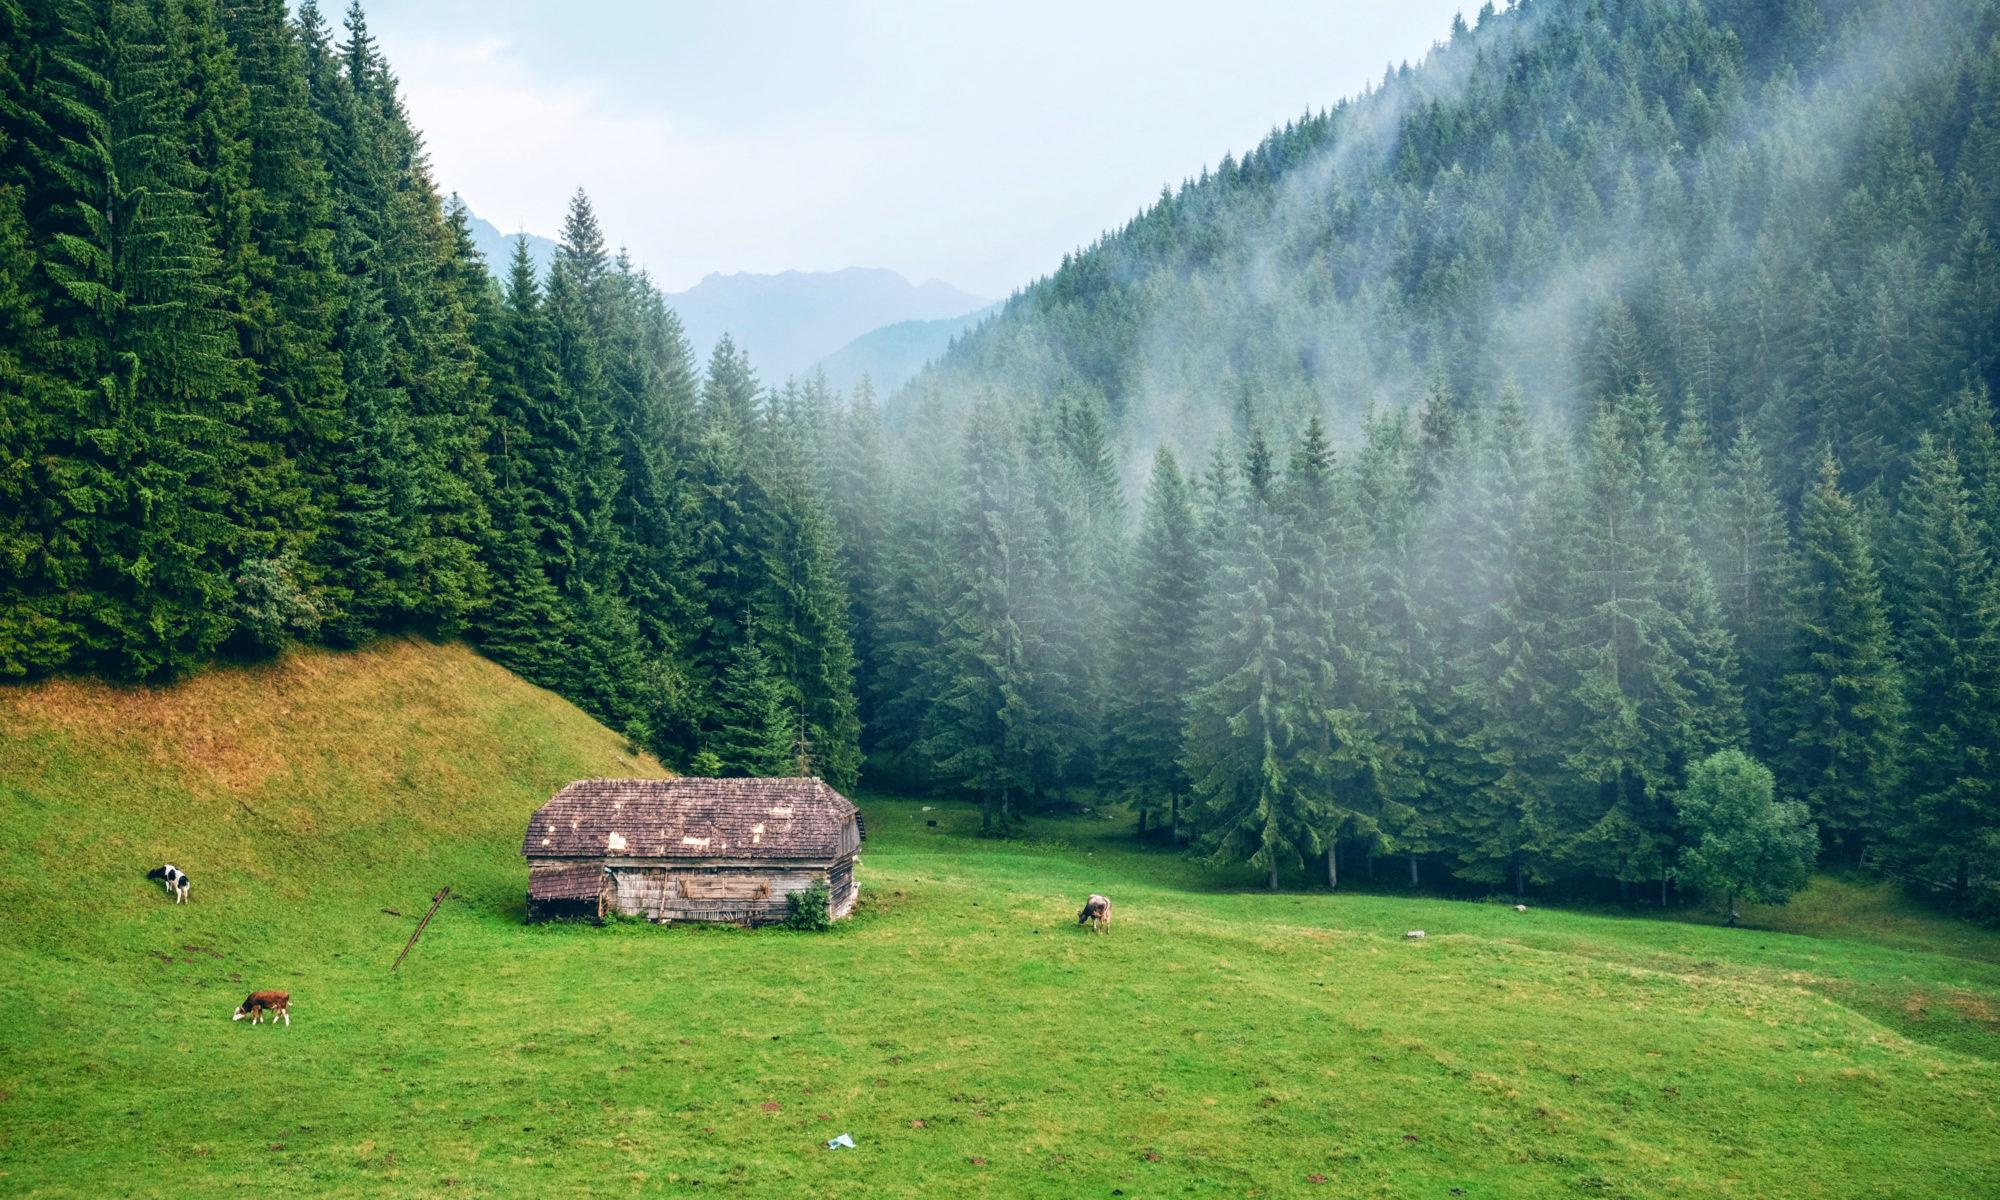 Forrest in Romania